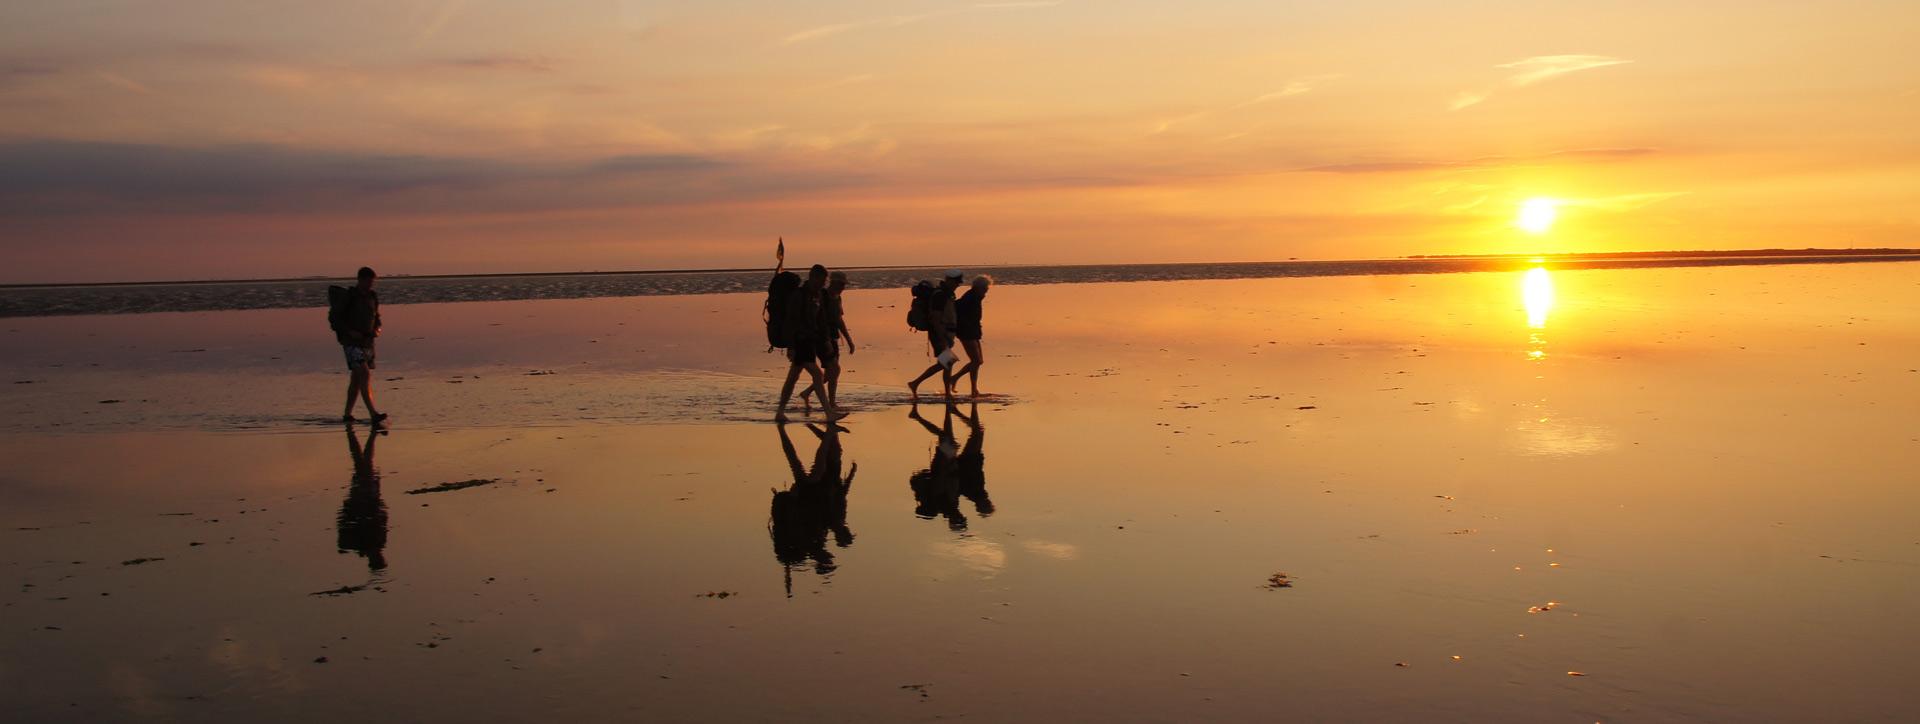 Leute am Strand bei Sonnenuntergang